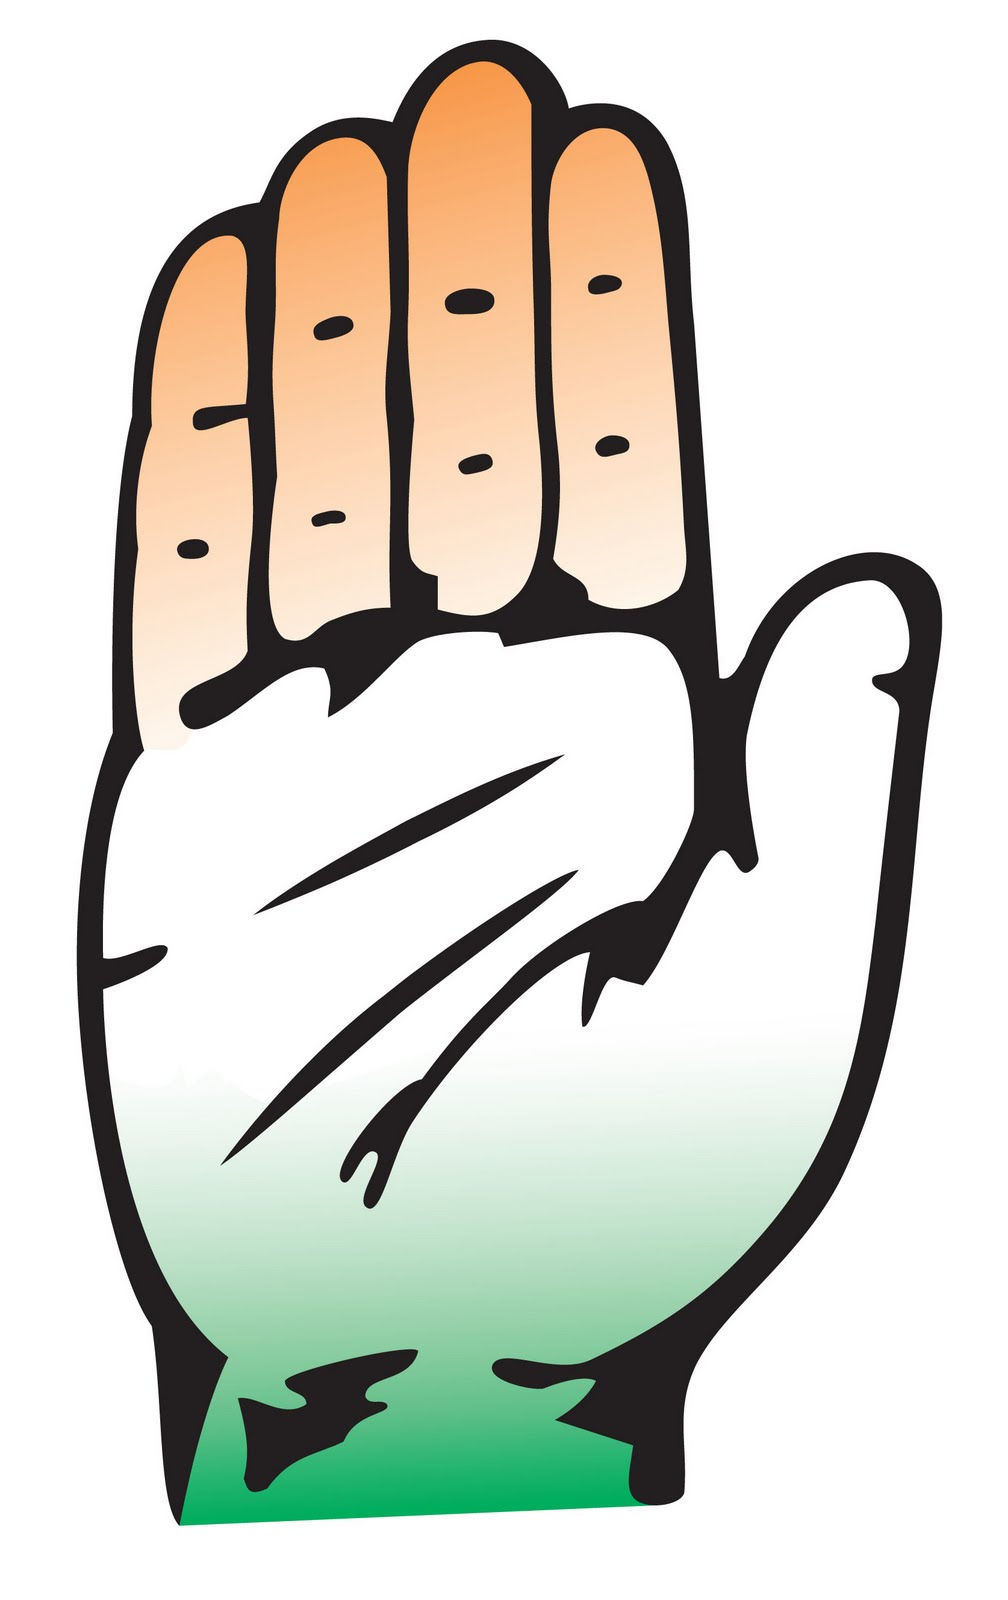 Political clipart congress Funding Funding ADR  833